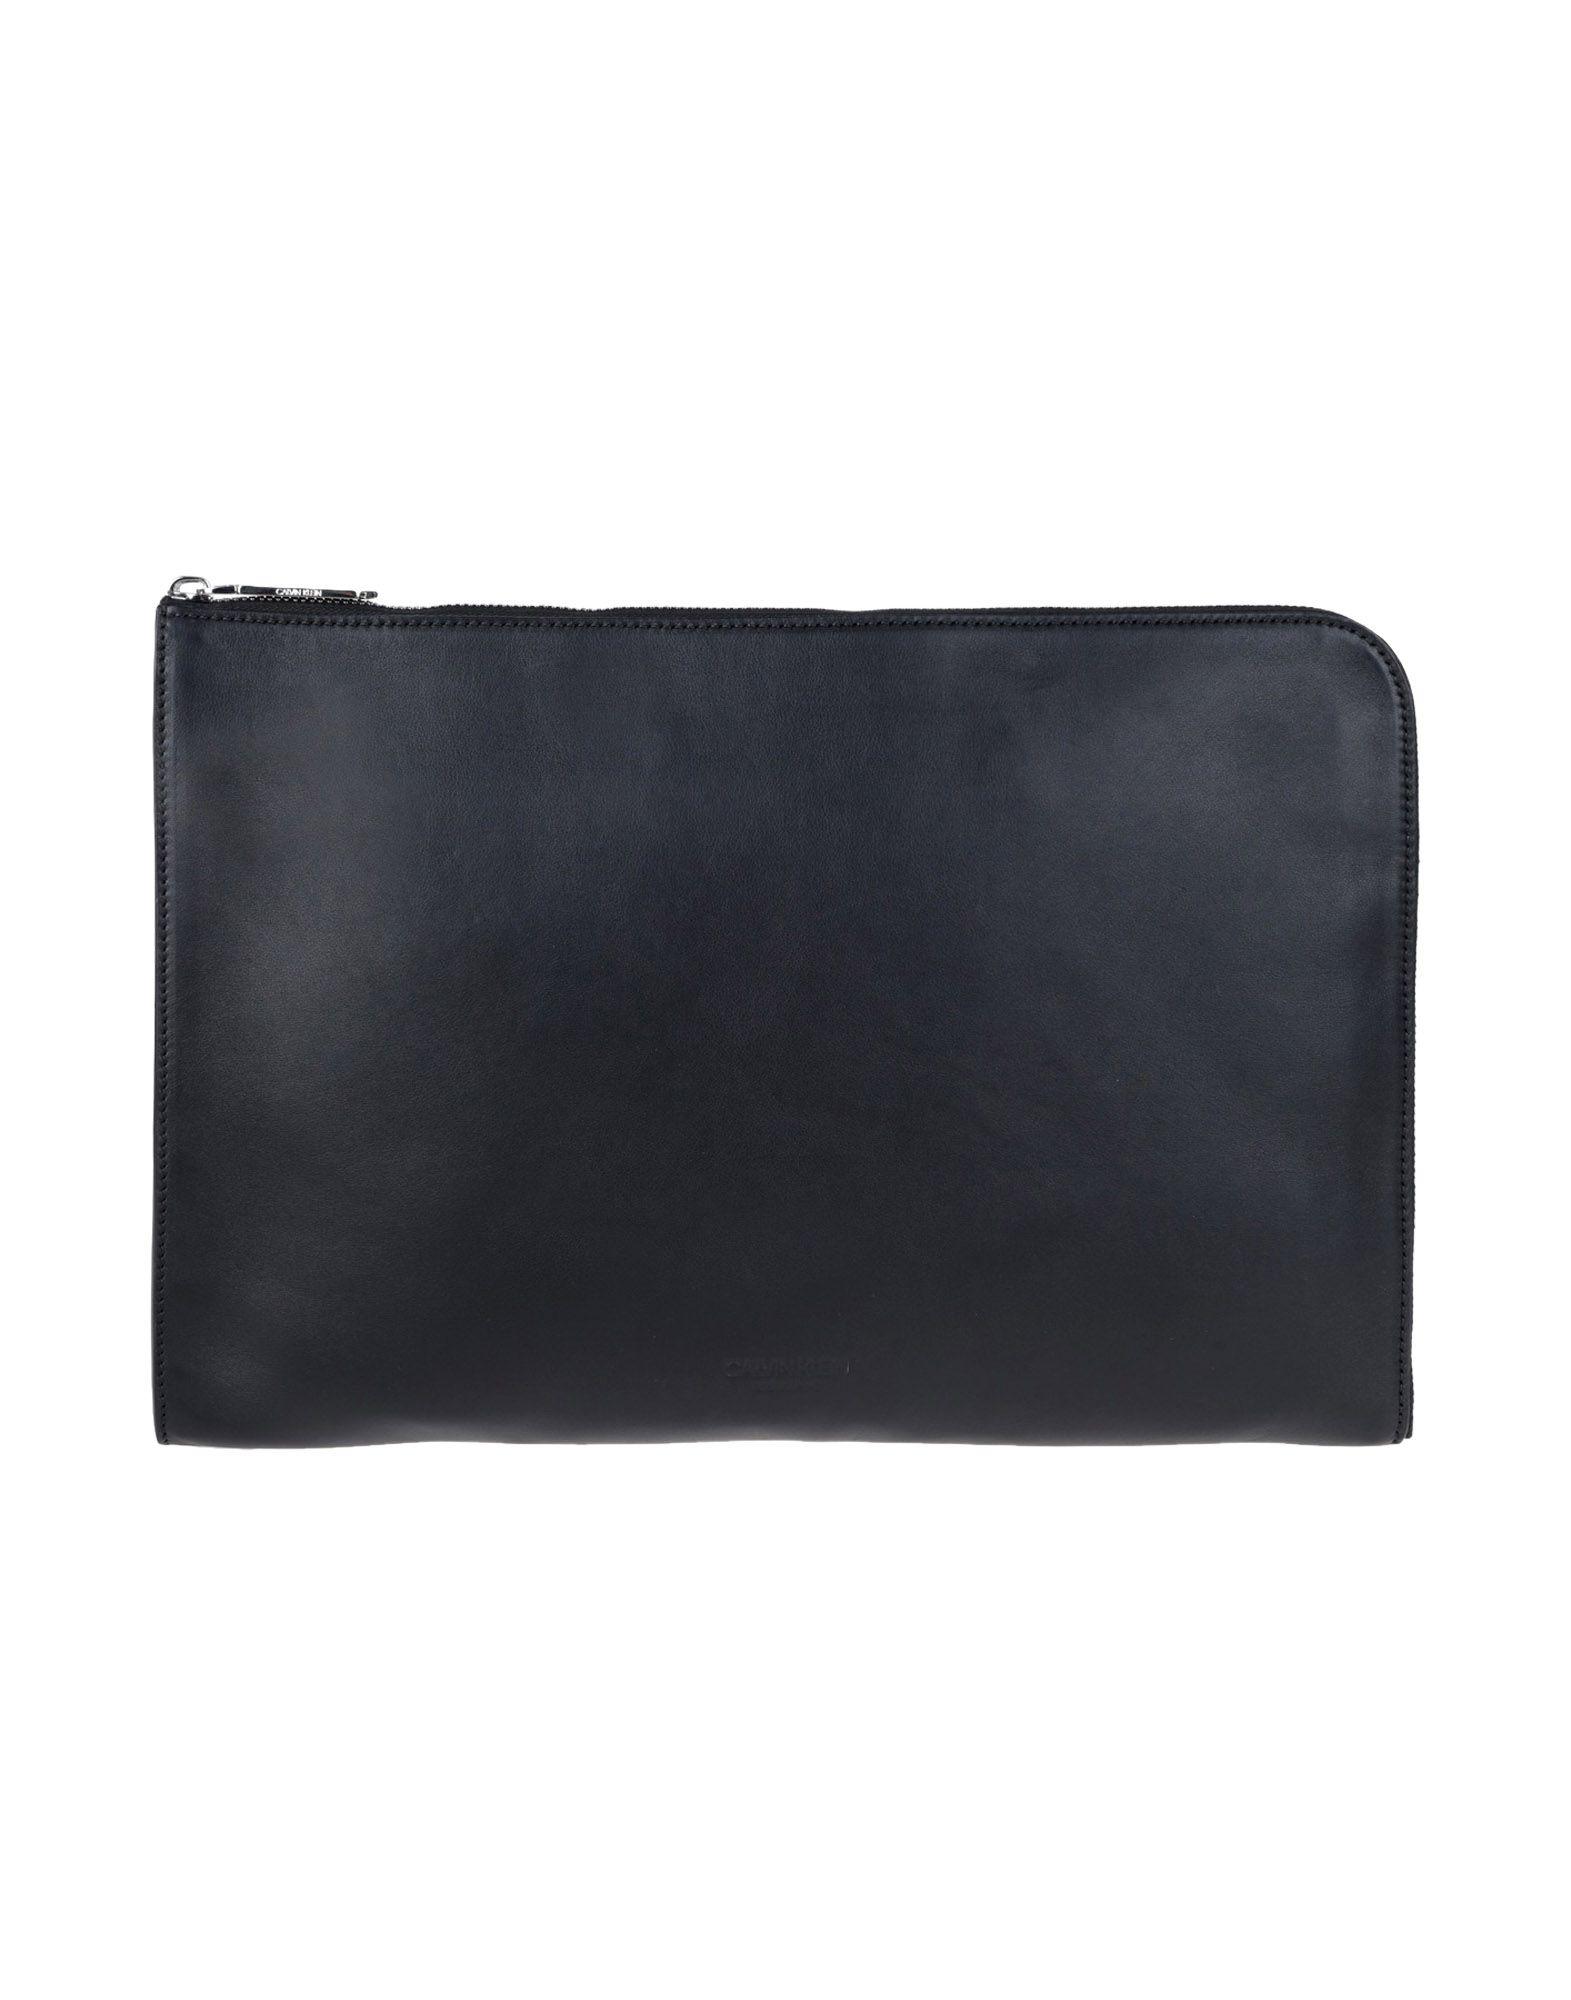 CALVIN KLEIN 205W39NYC Деловые сумки женские сумки